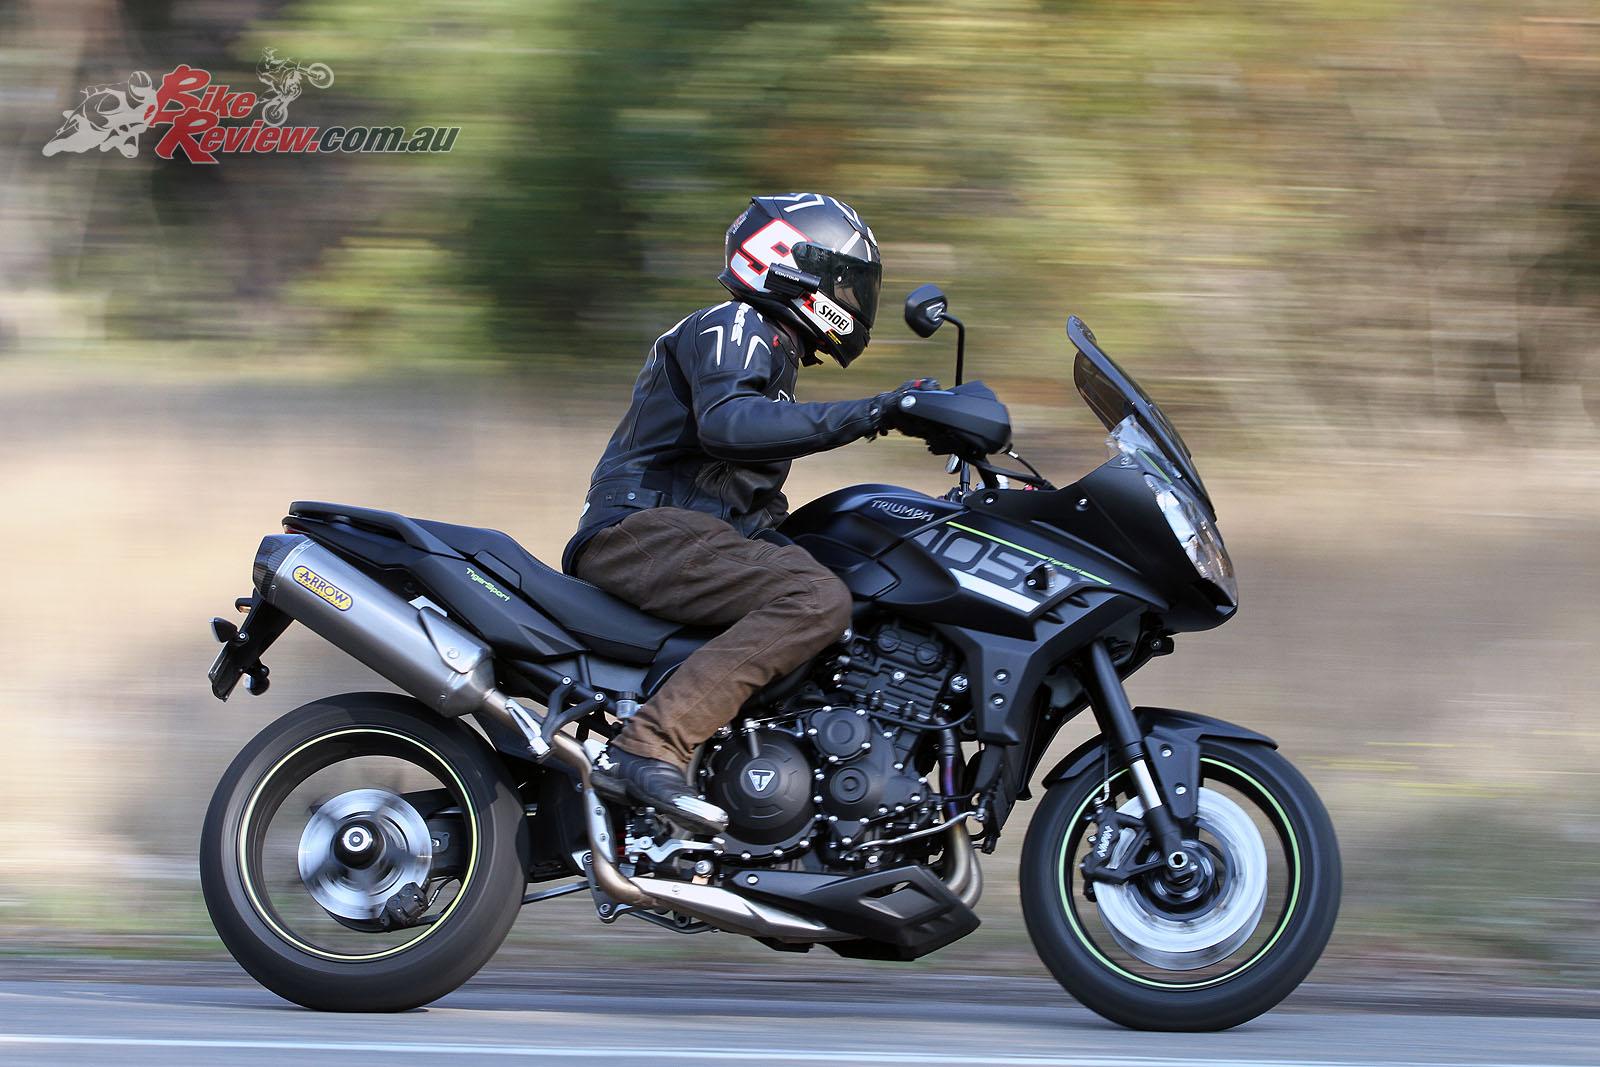 Review: 2016 Triumph Tiger Sport - Bike Review